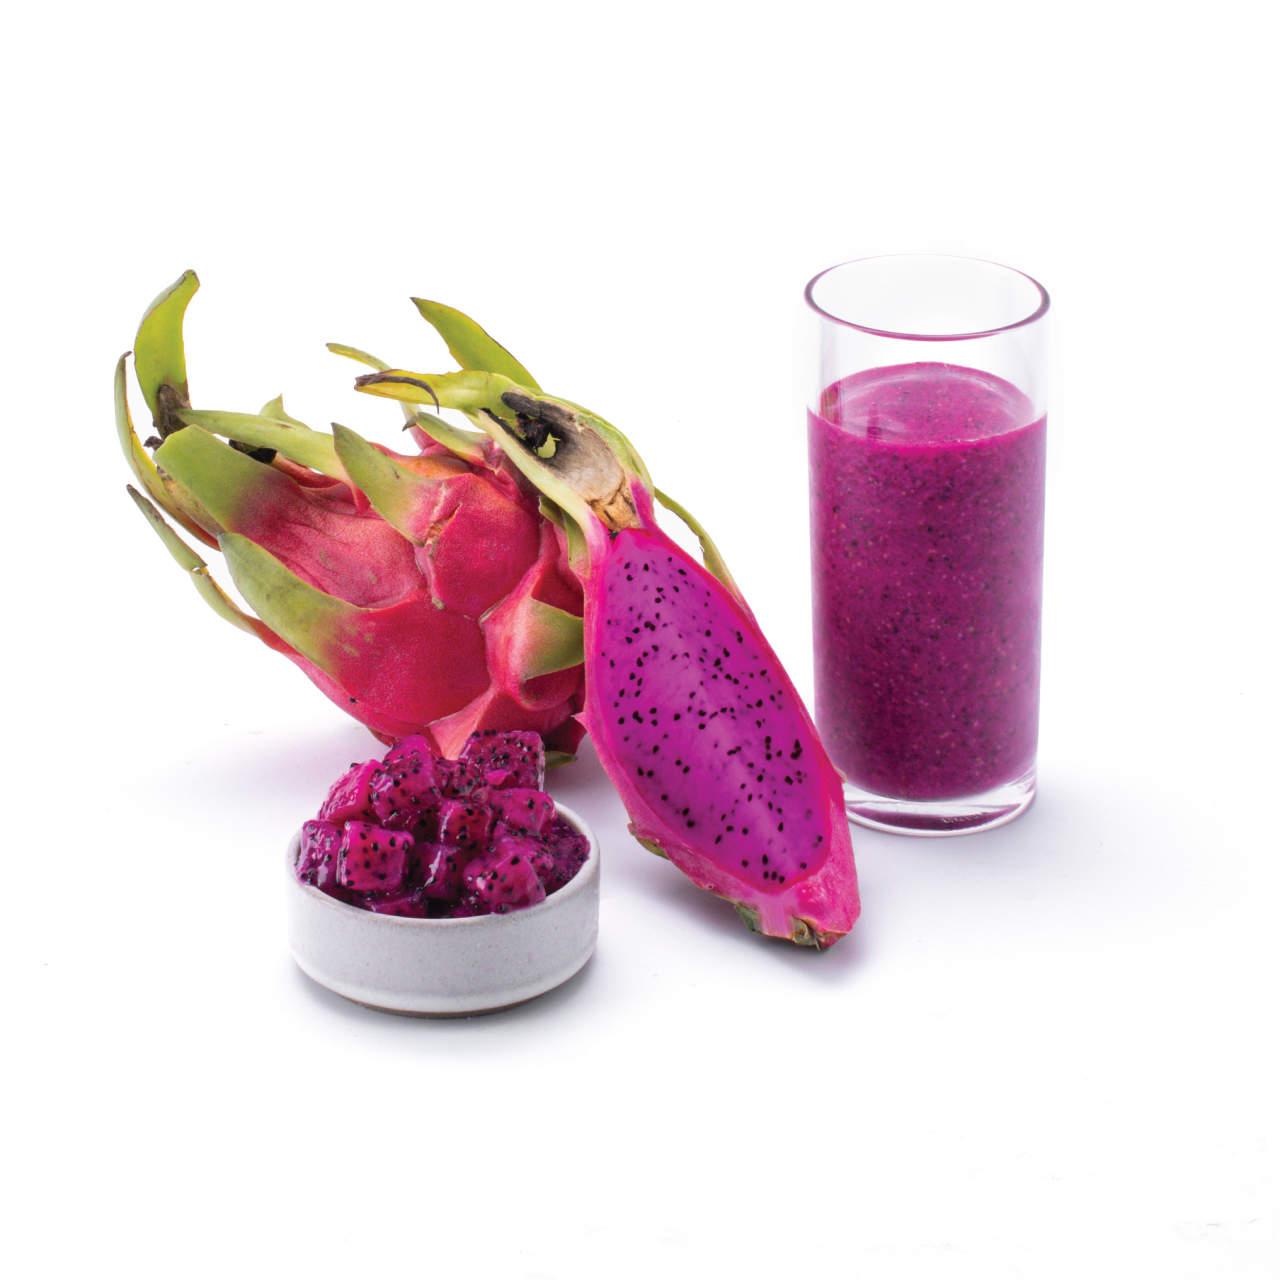 Pitaya, Juice, Purple, Drink, Food, Smoothie, Plant, Beetroot, Magenta, Fruit